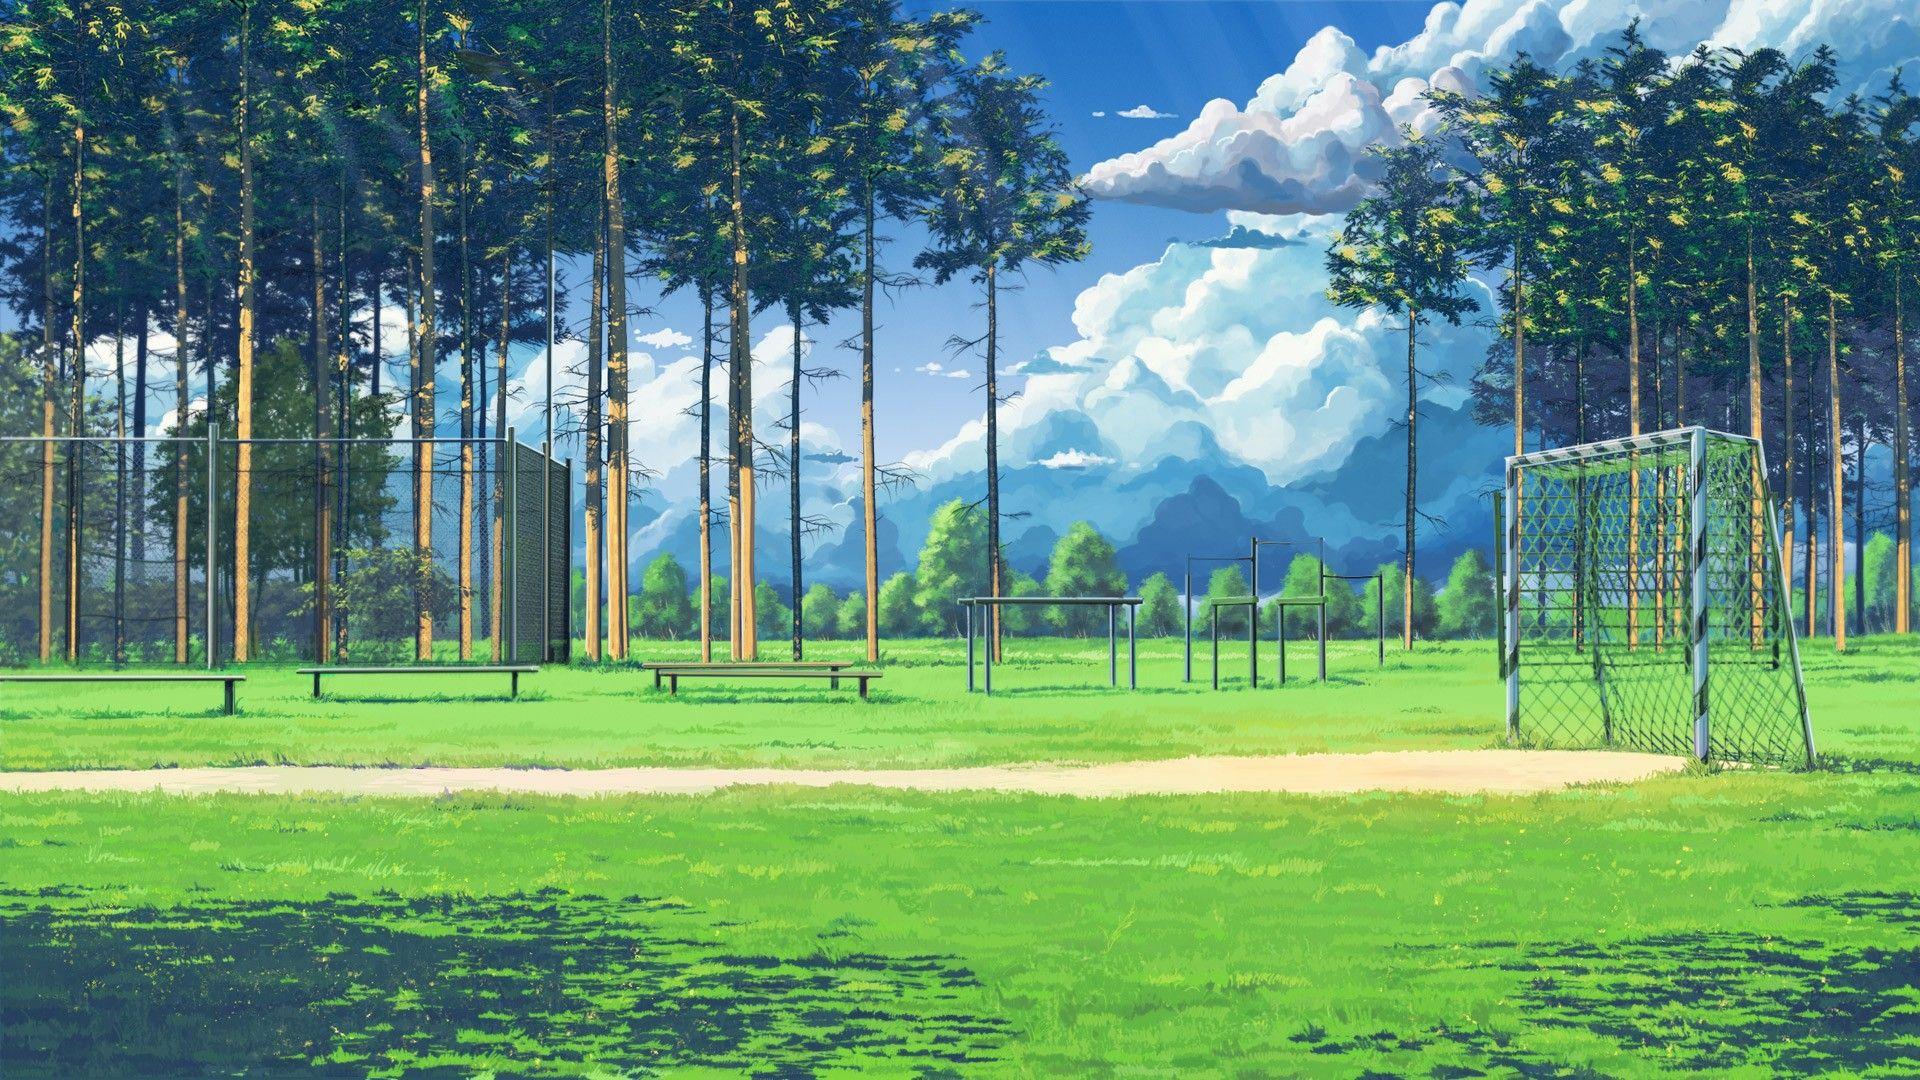 Soccer Field 1920 1080 R Wallpapers Pemandangan Anime Latar Belakang Pemandangan